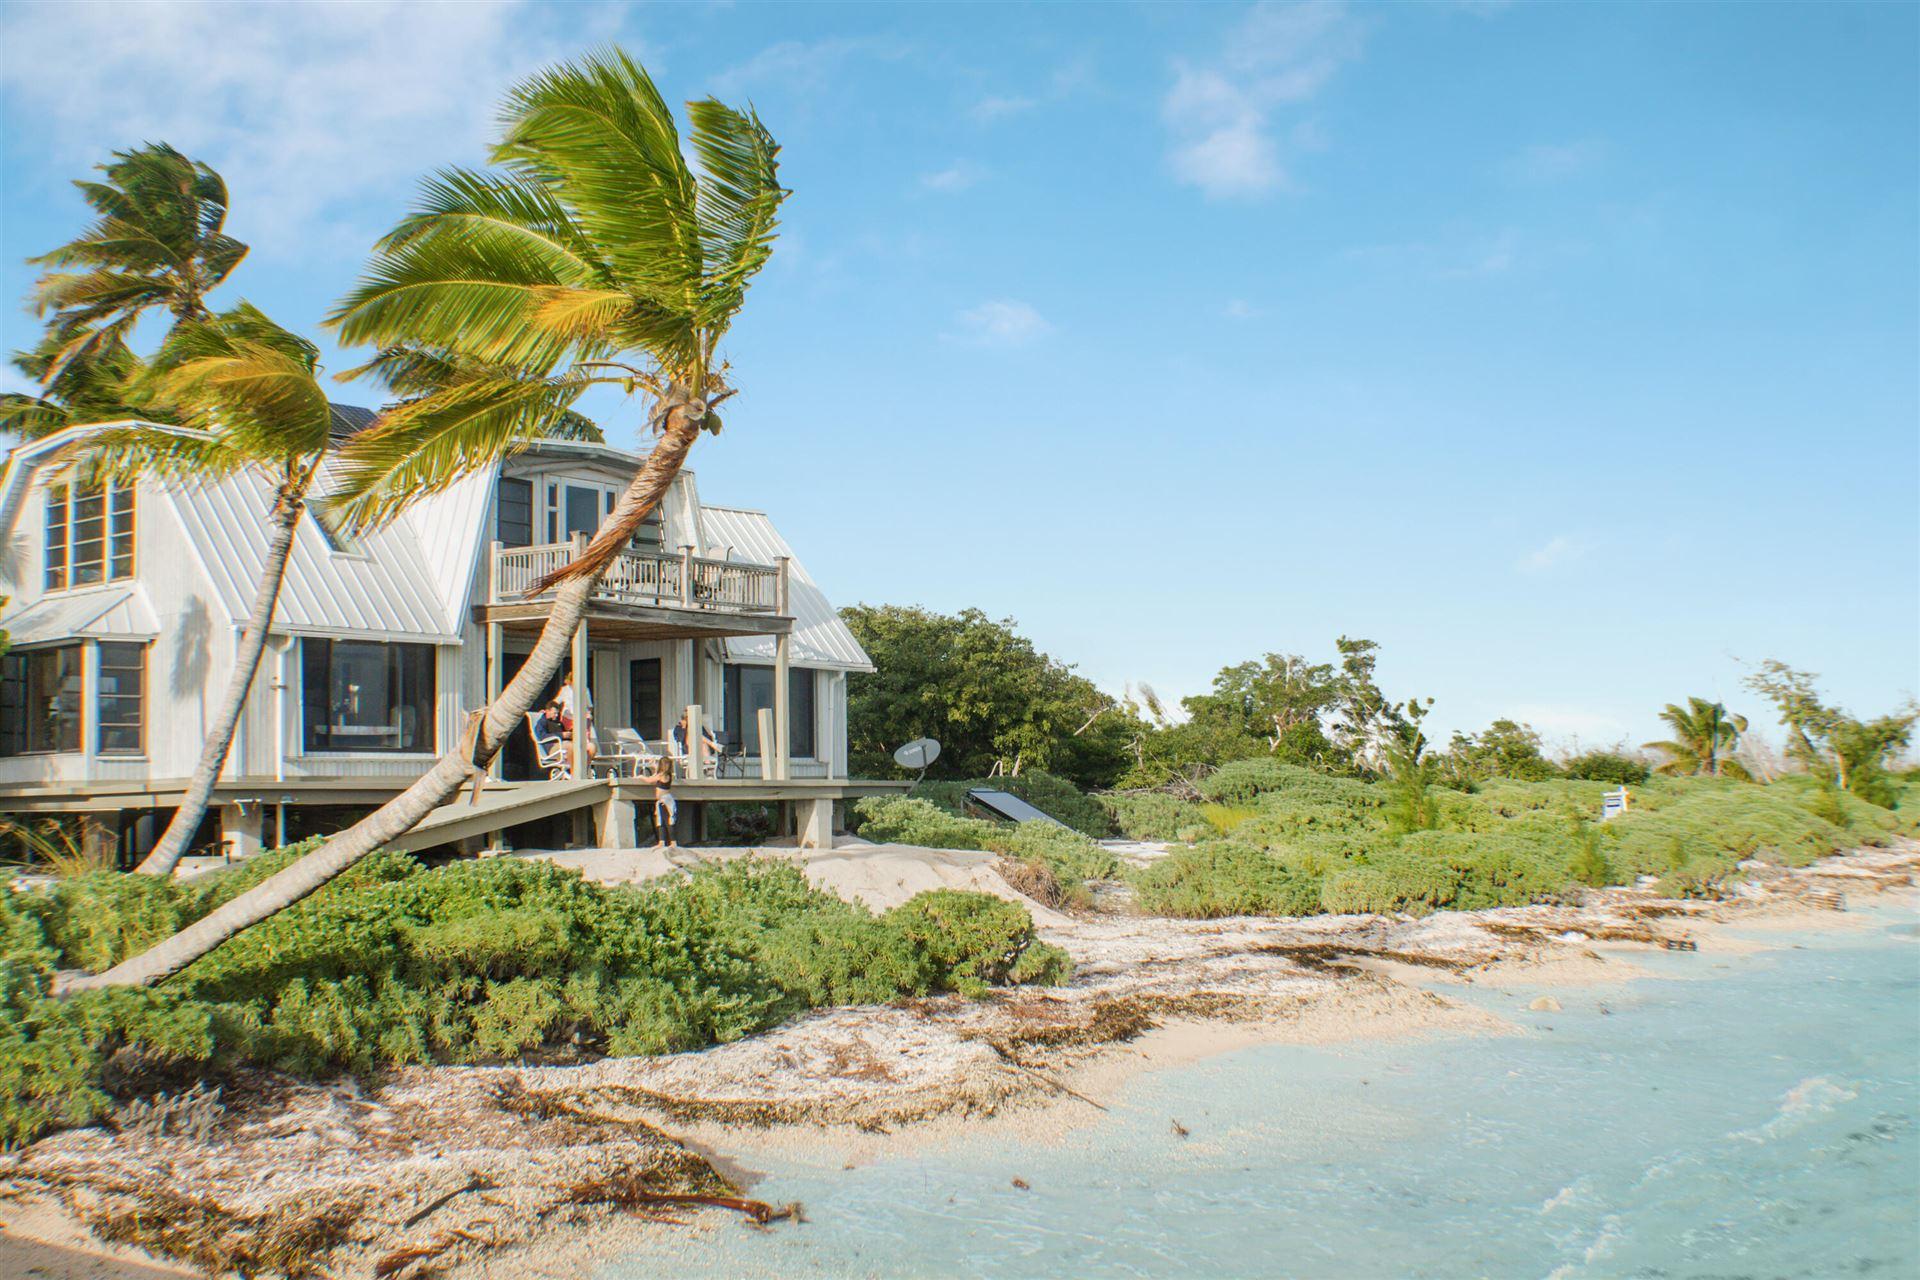 7W Cook Island, Big Pine, FL 33043 - #: 596418